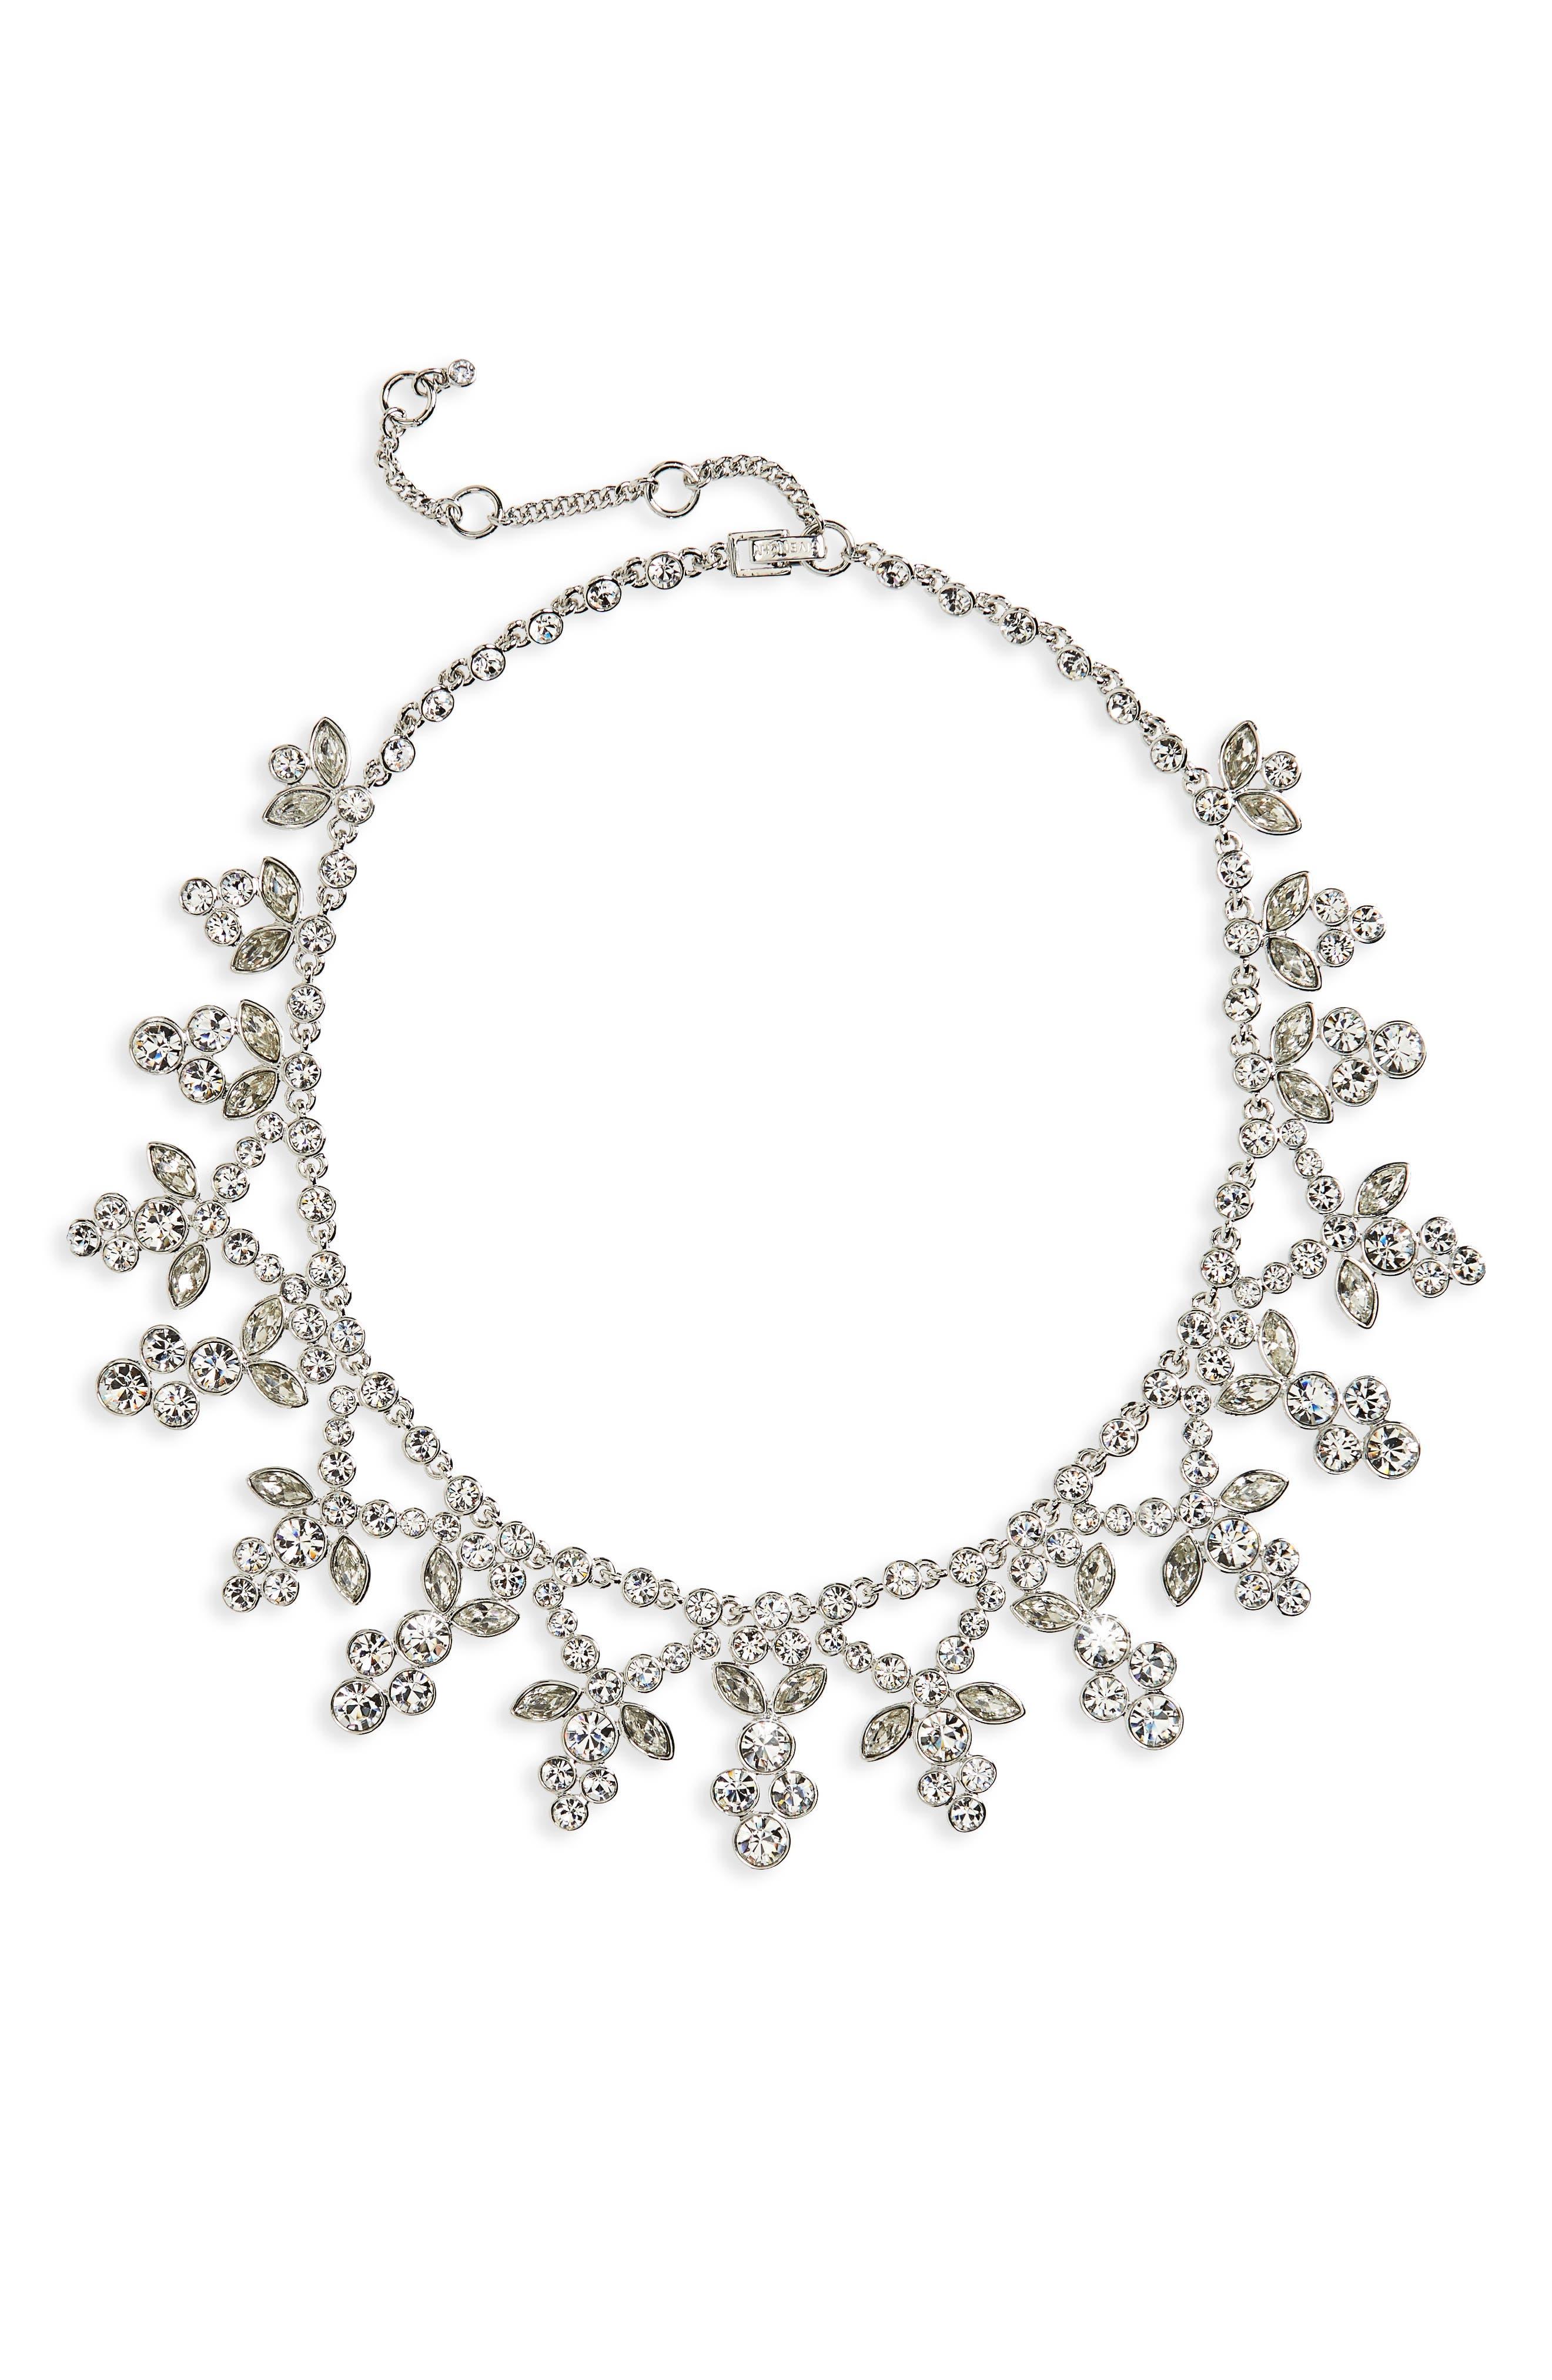 Main Image - Givenchy Sydney Drama Collar Necklace